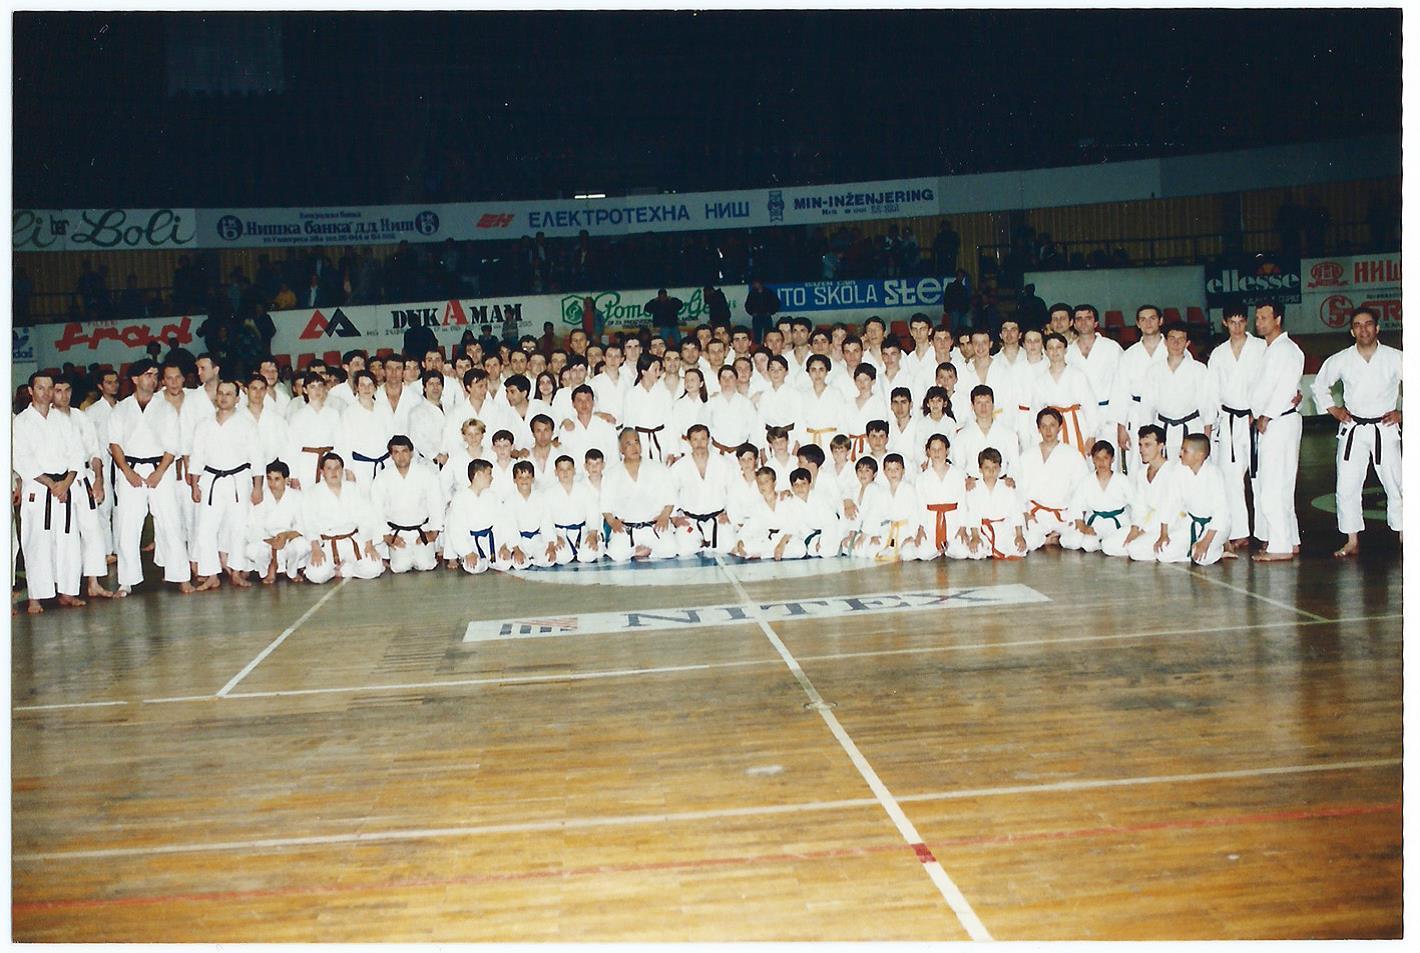 serbia1.jpg